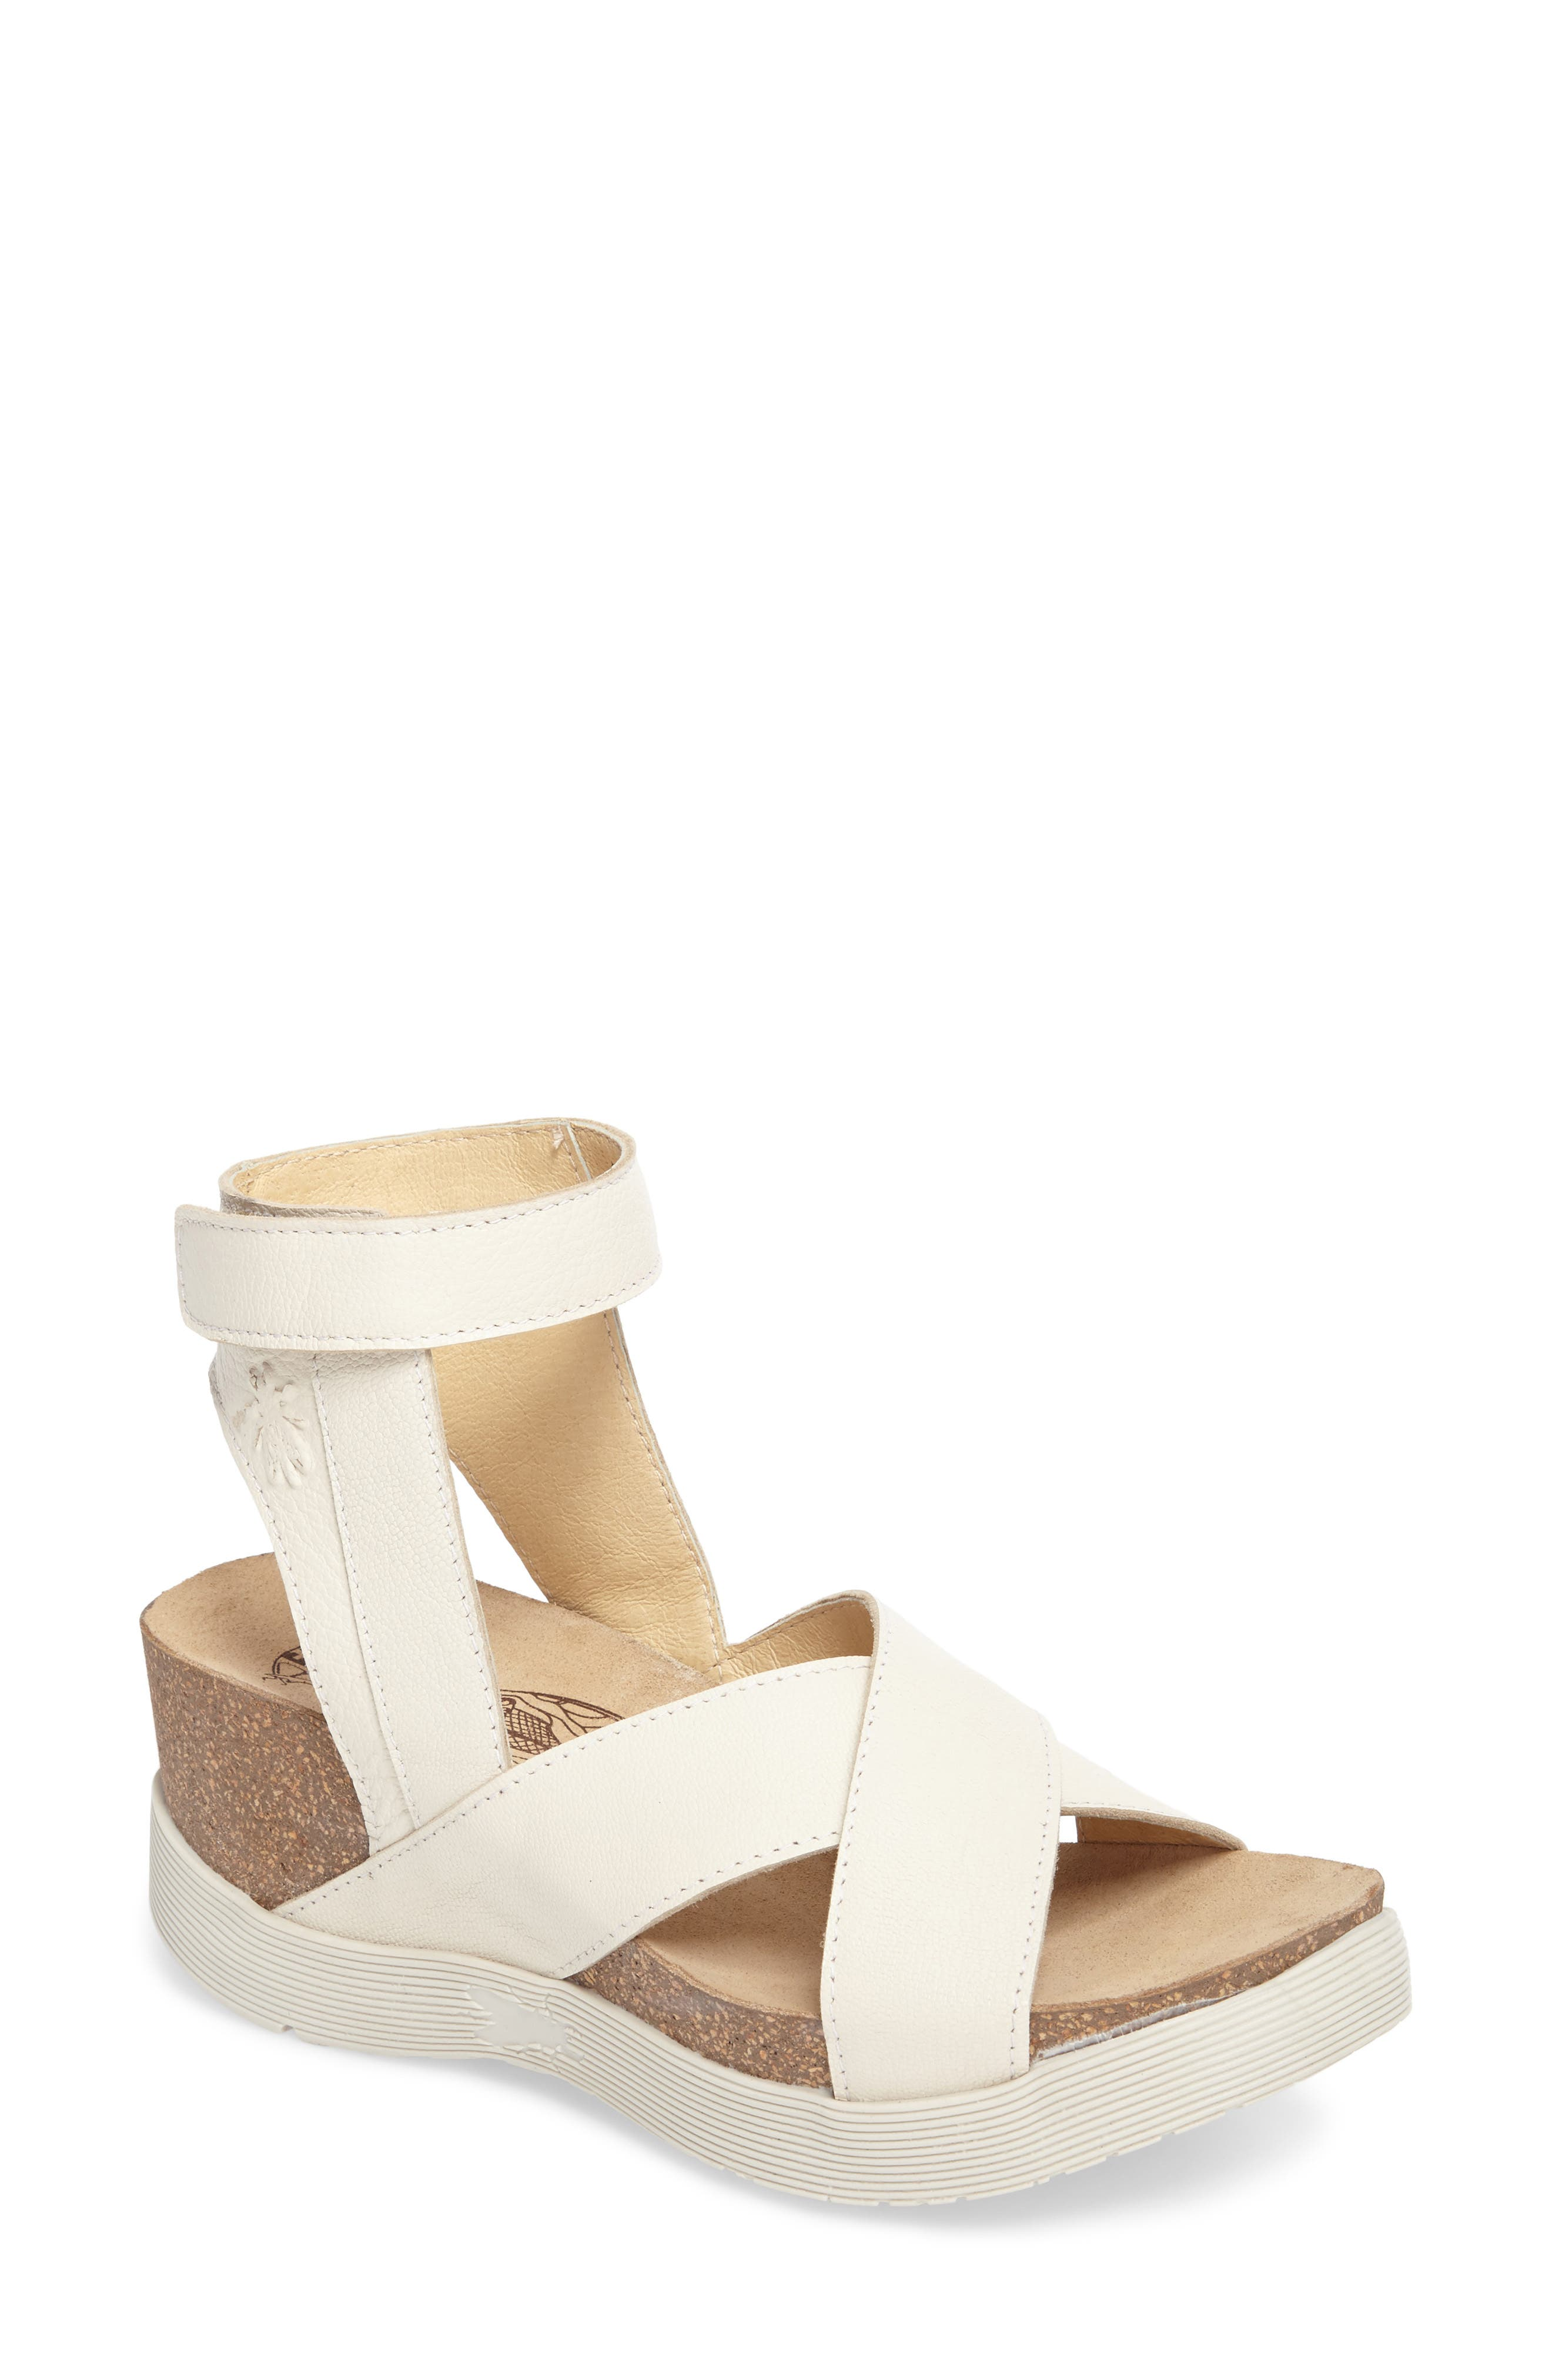 Main Image - Fly London Weel Platform Sandal (Women)